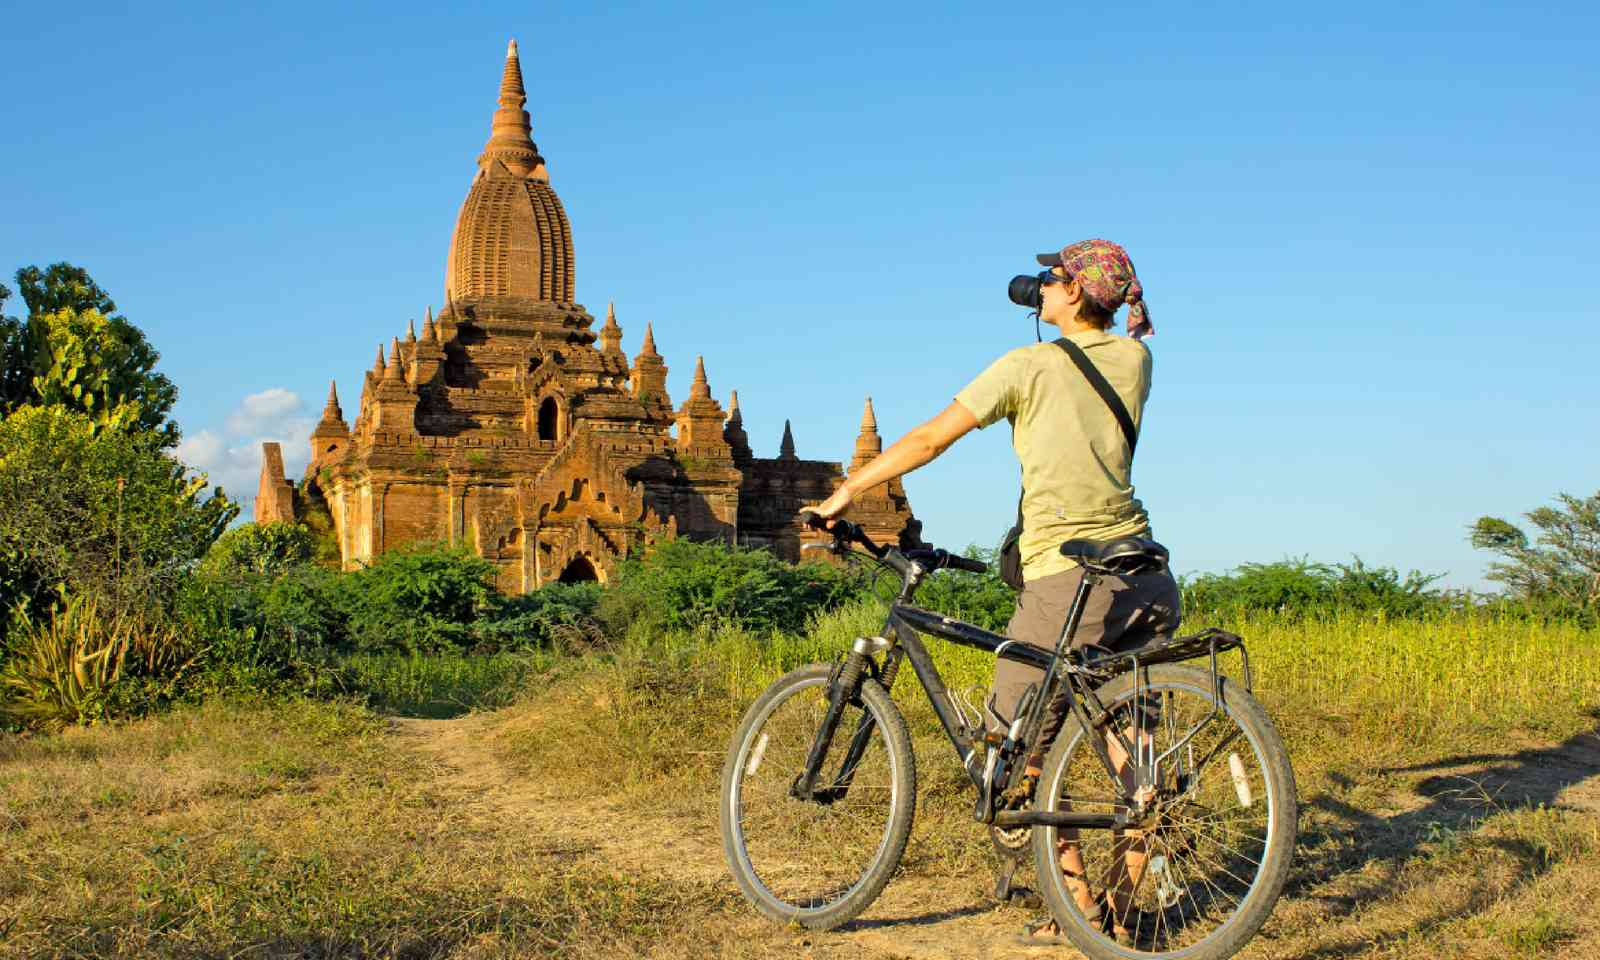 Photographer in Burma (Shutterstock)